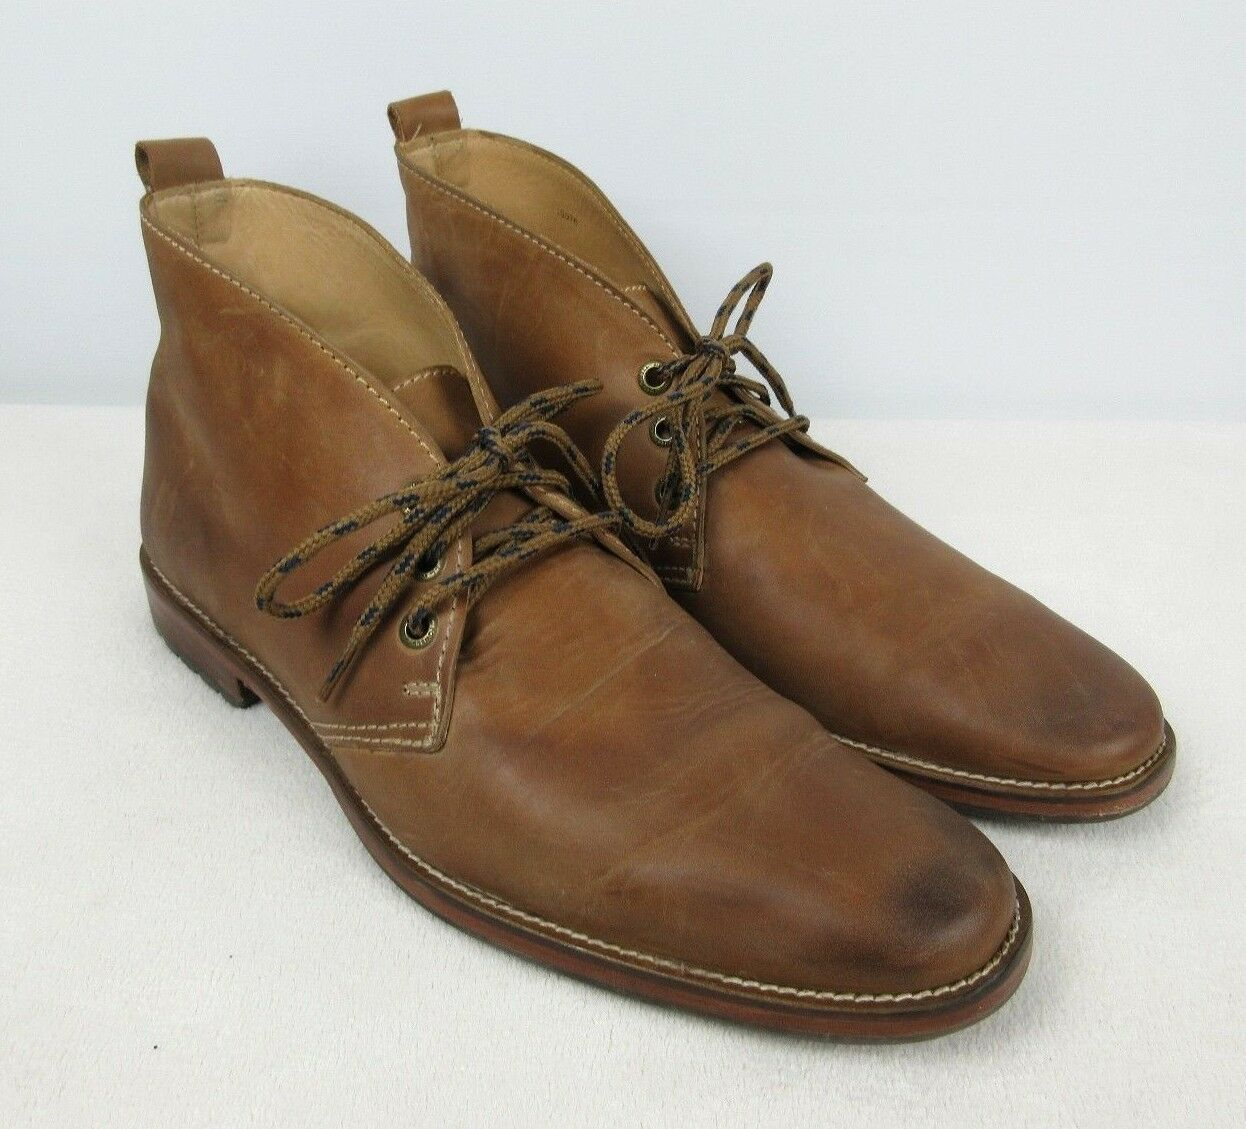 J.L. POWELL Sporting Life Chukka Ankle Desert Boots Tan Sz 11 NICE Men's